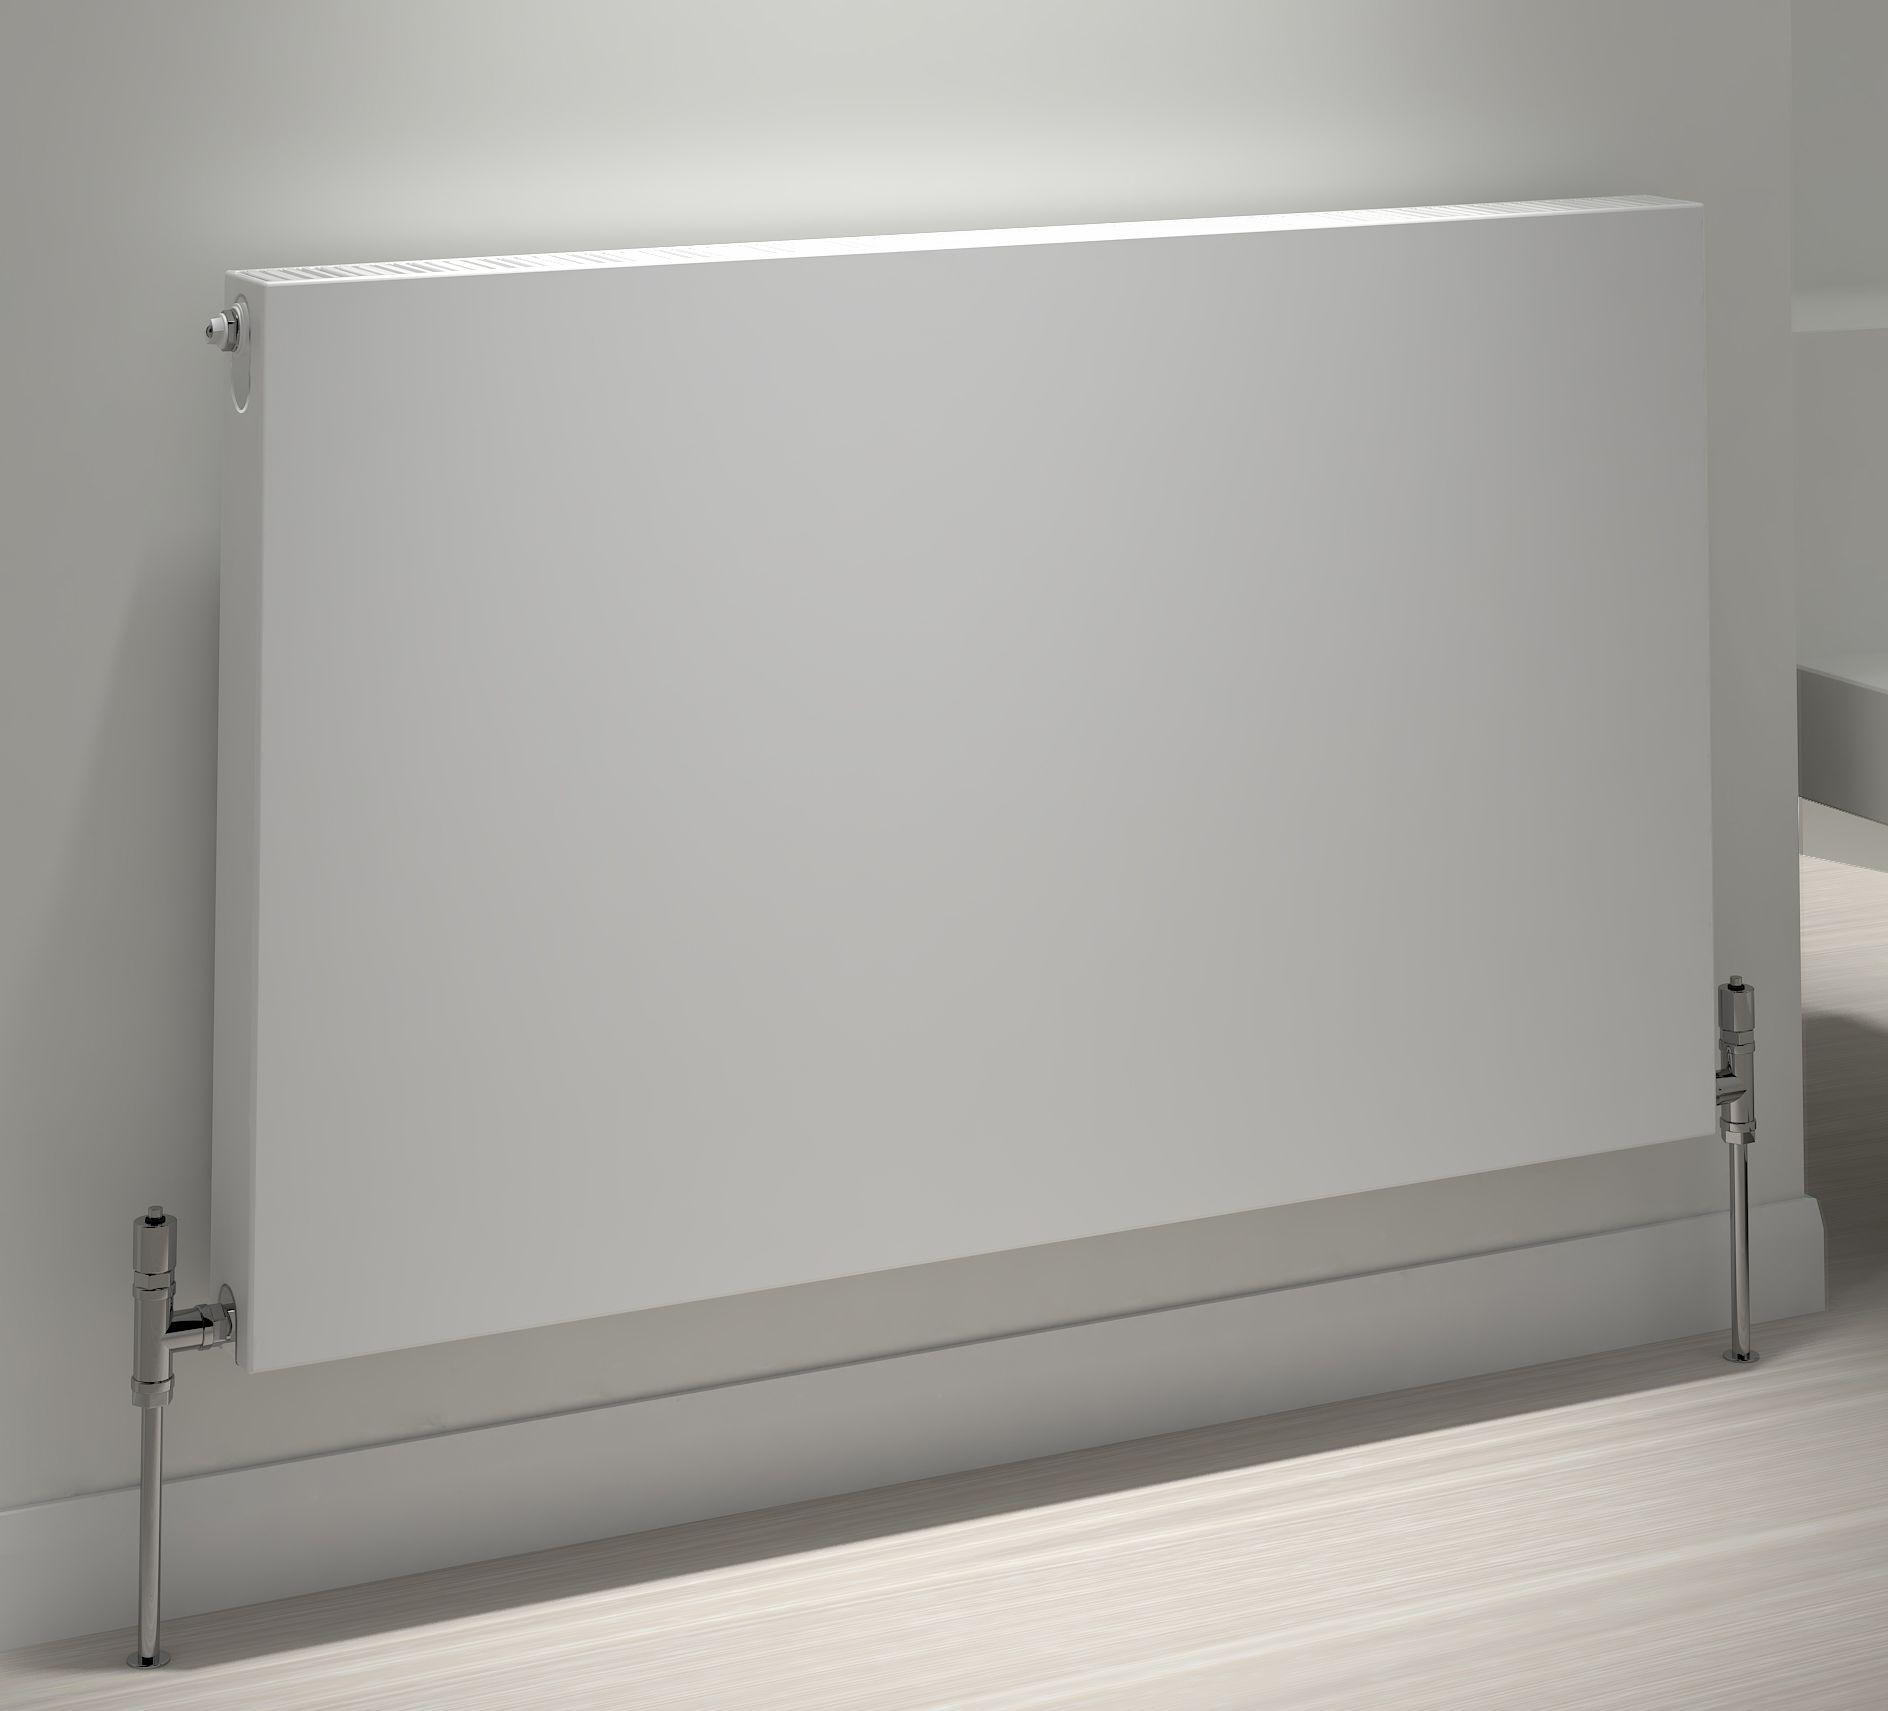 Kudox Flat Surface Radiator Type 21 Double Panel Single ...